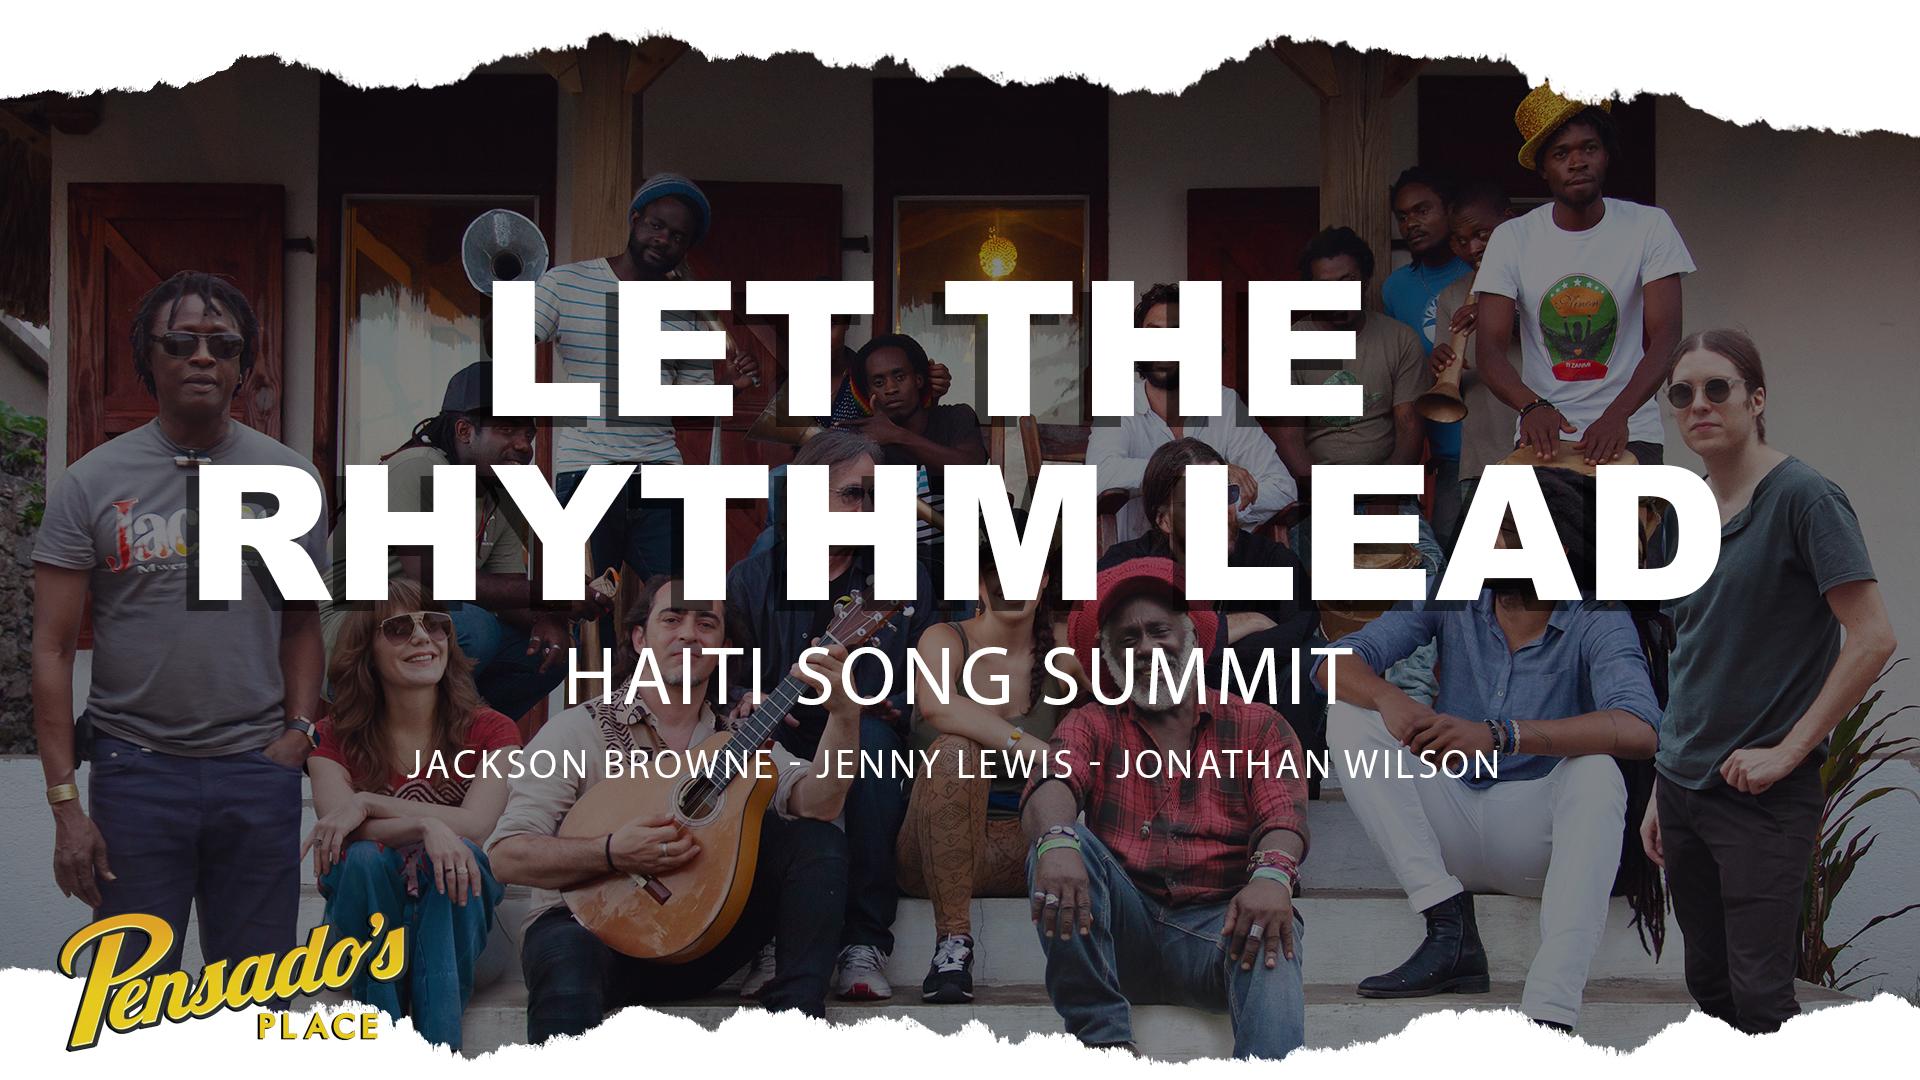 """Let The Rhythm Lead"" Jackson Browne, Jenny Lewis, and Jonathan Wilson"